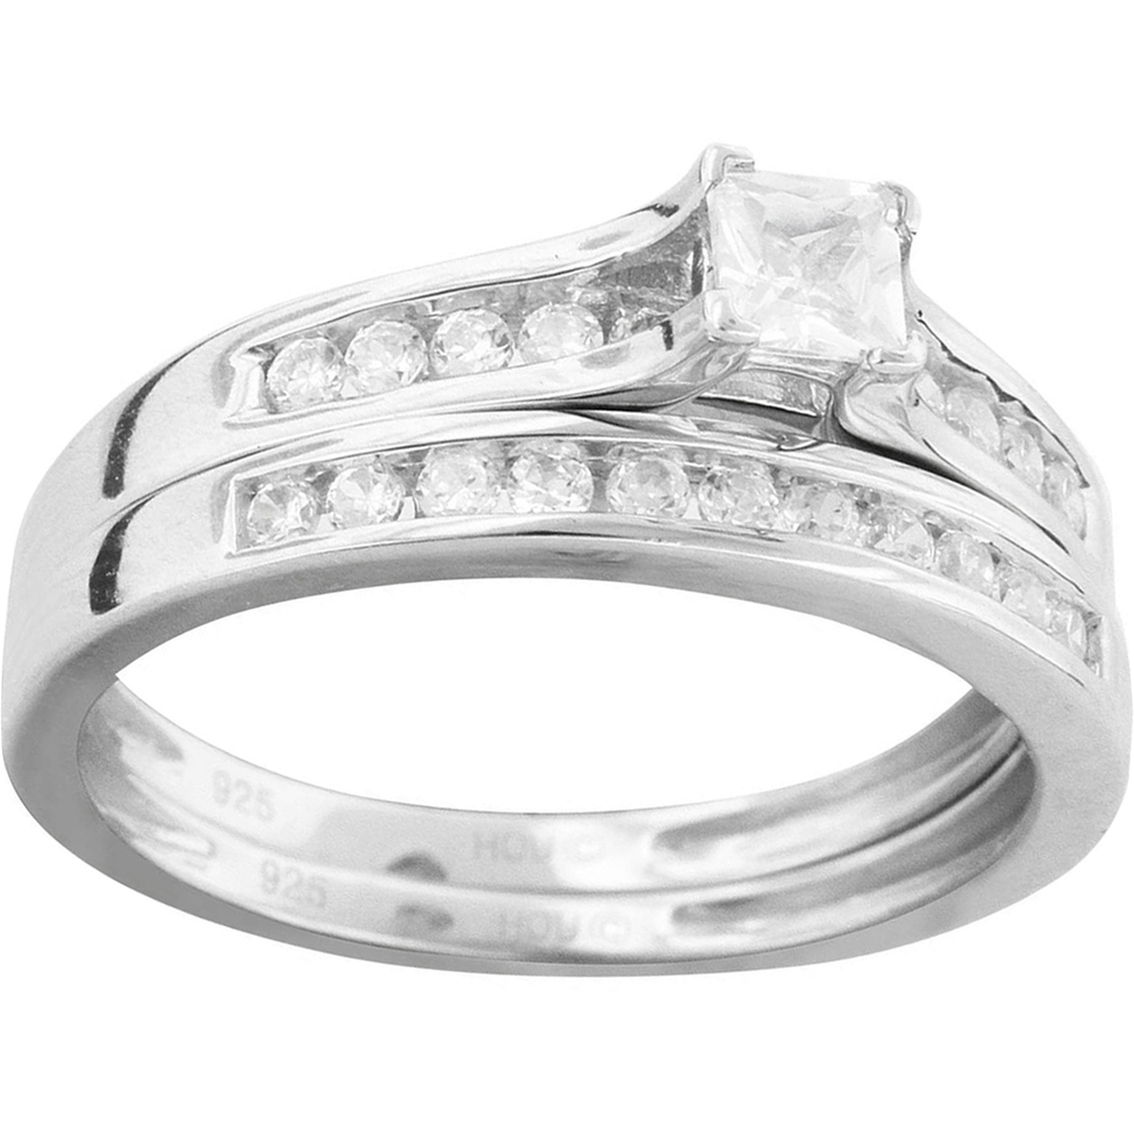 14k White Gold 1 2 Ctw Princess Cut And Round Diamond Bridal Set